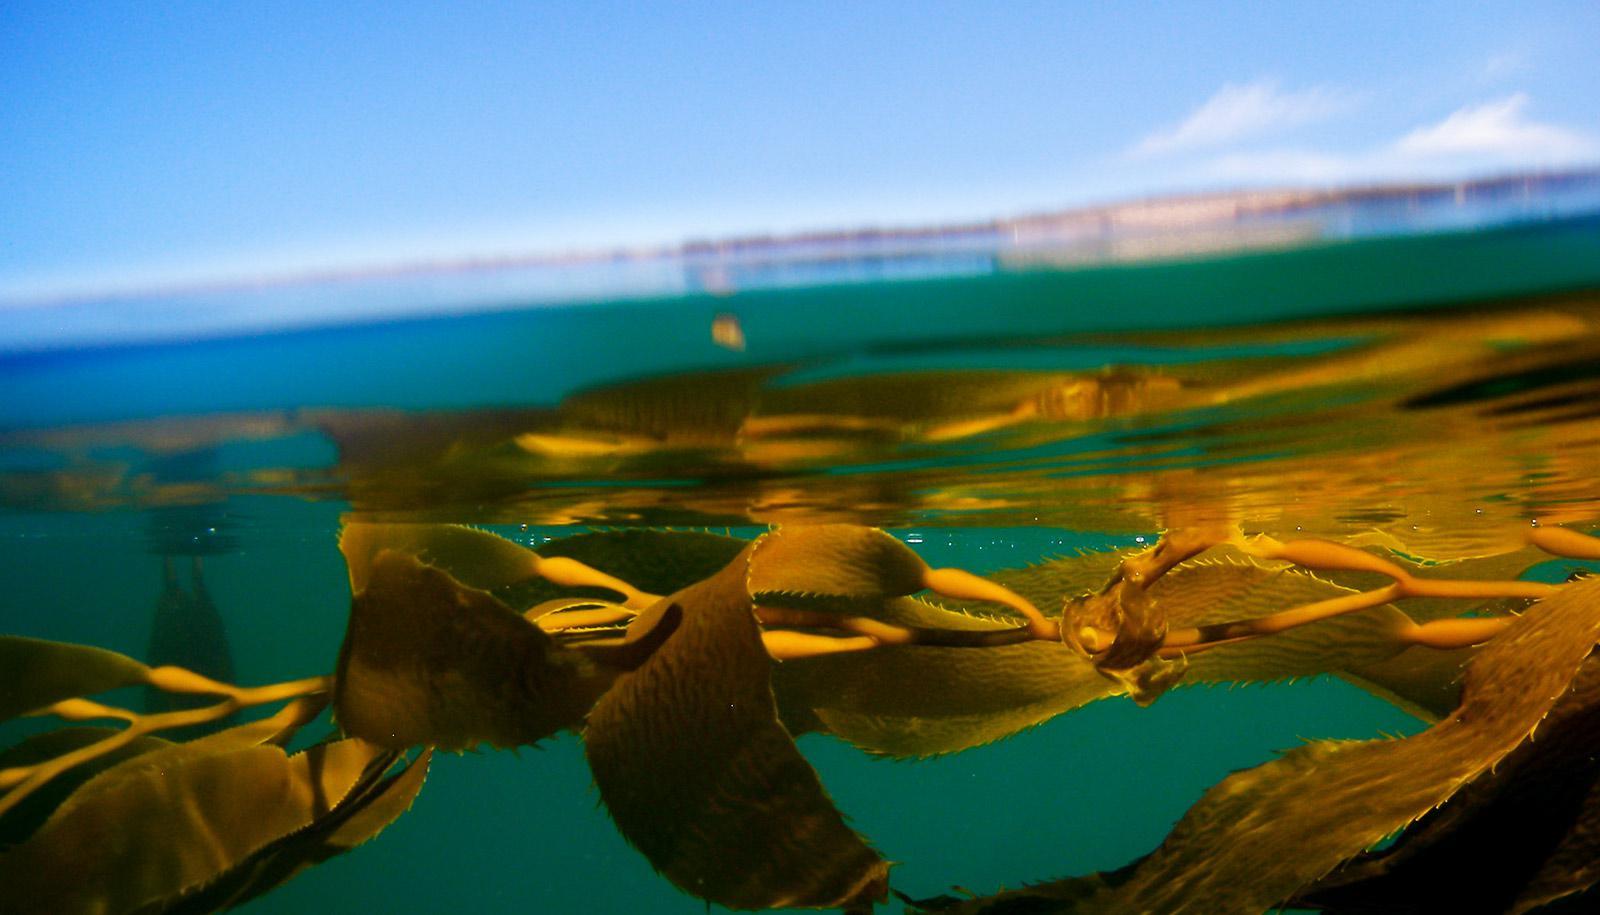 half-underwater shot of kelp